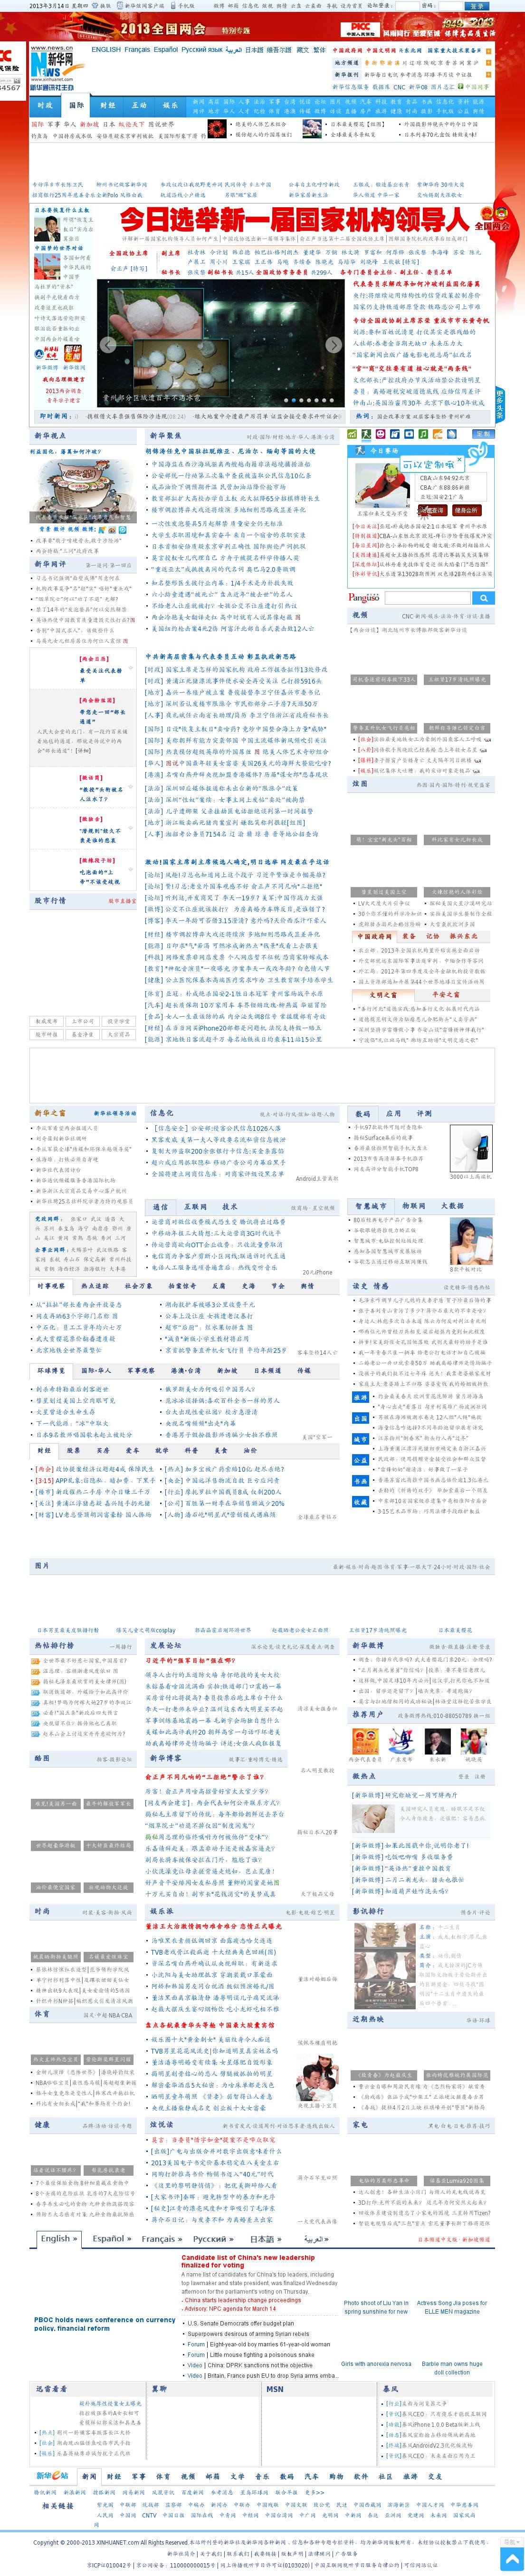 Xinhua at Thursday March 14, 2013, 12:28 a.m. UTC